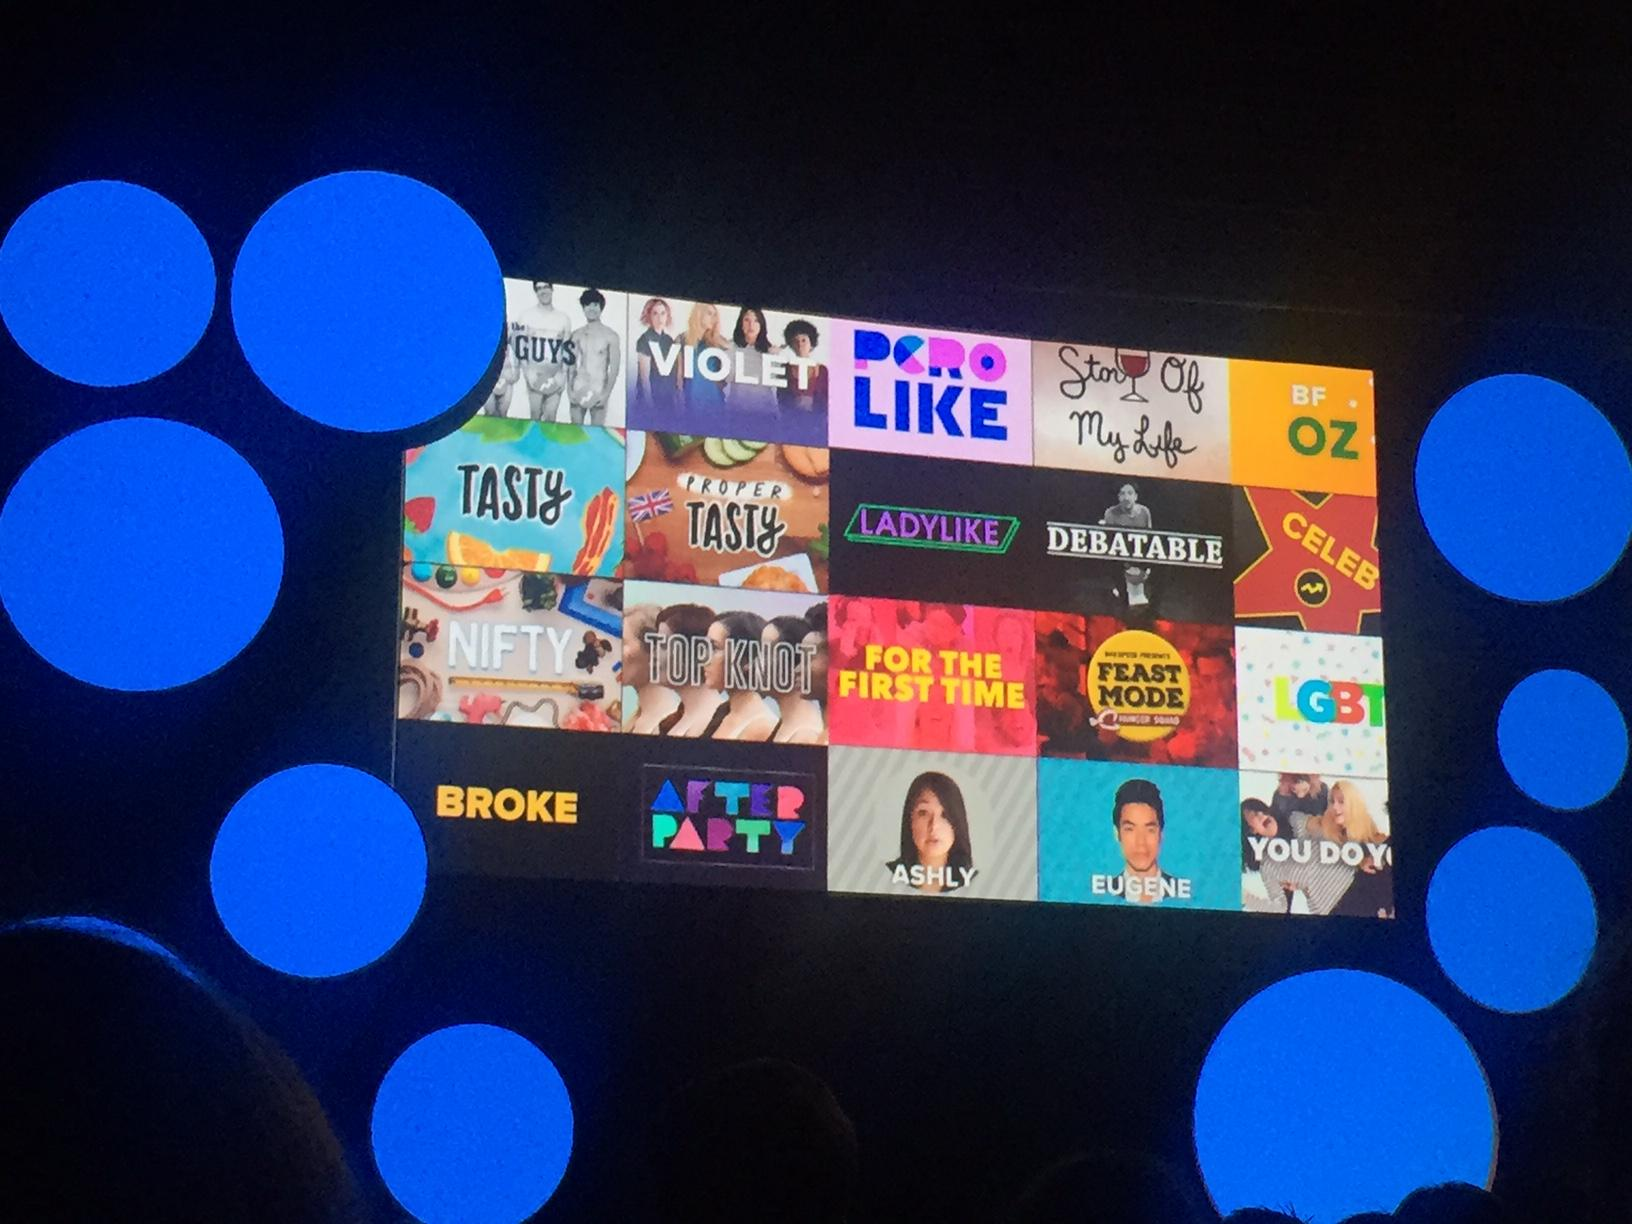 Buzzfeed video franchises